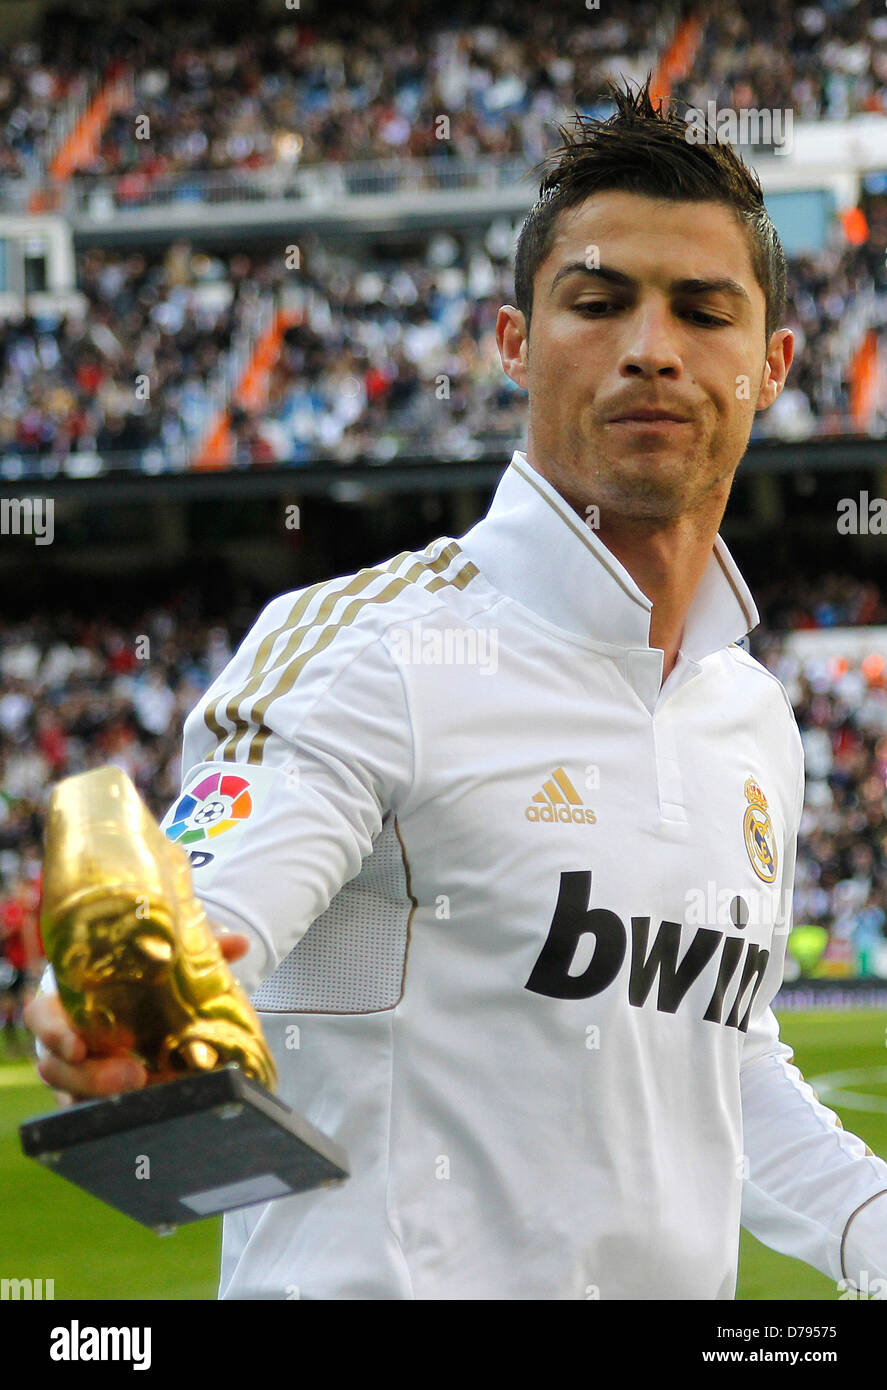 d5ae567855 Cristiano Ronaldo receives the